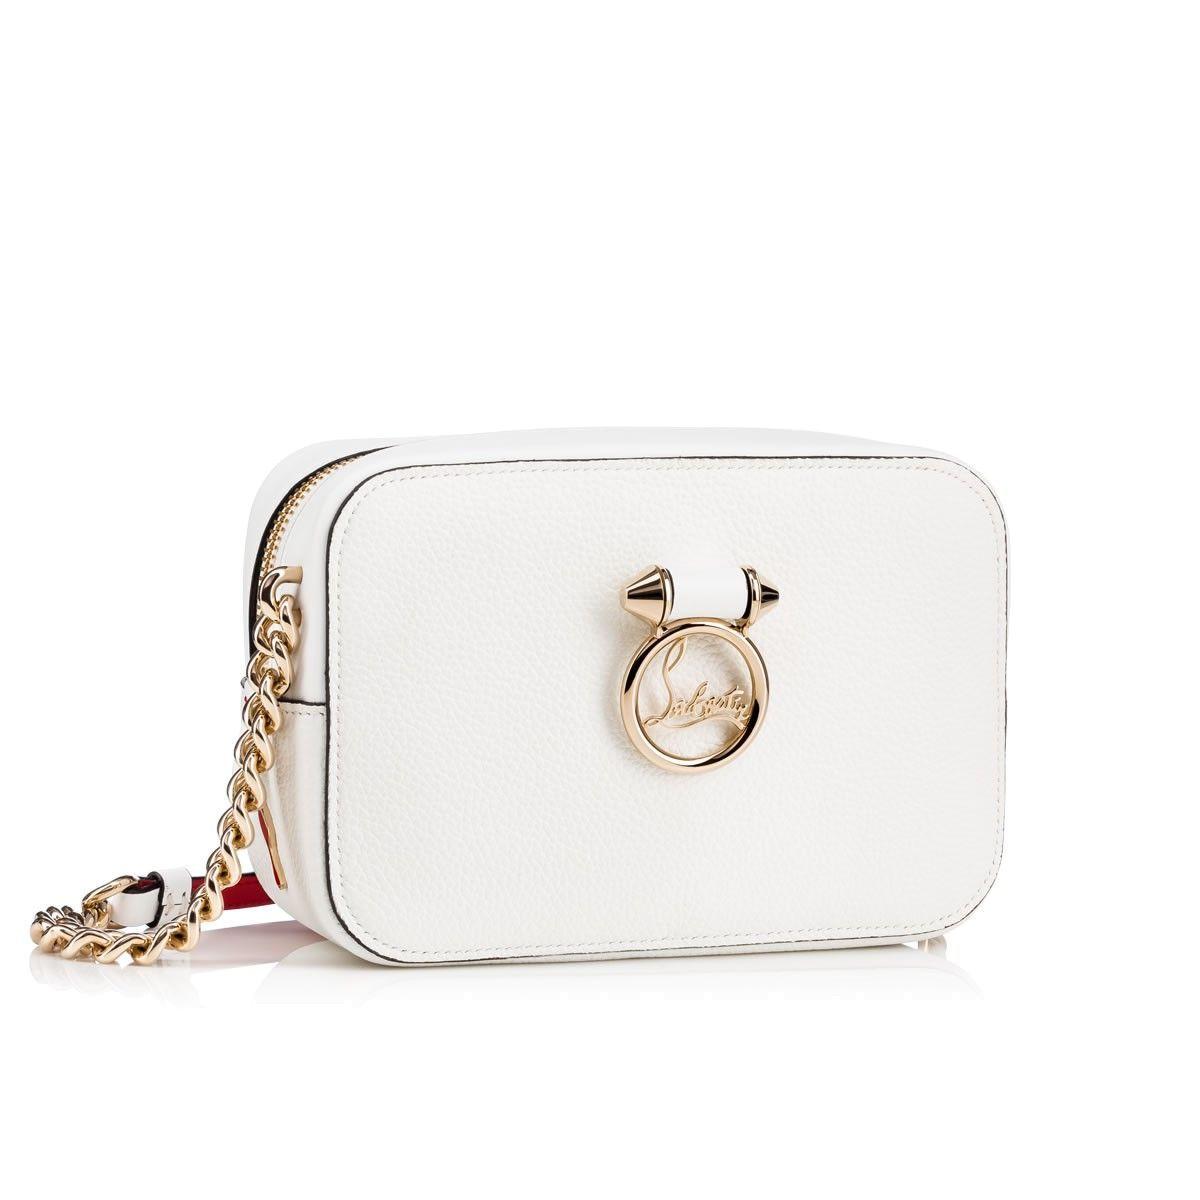 Rubylou mini white leather bag Christian Louboutin CVNhp1g